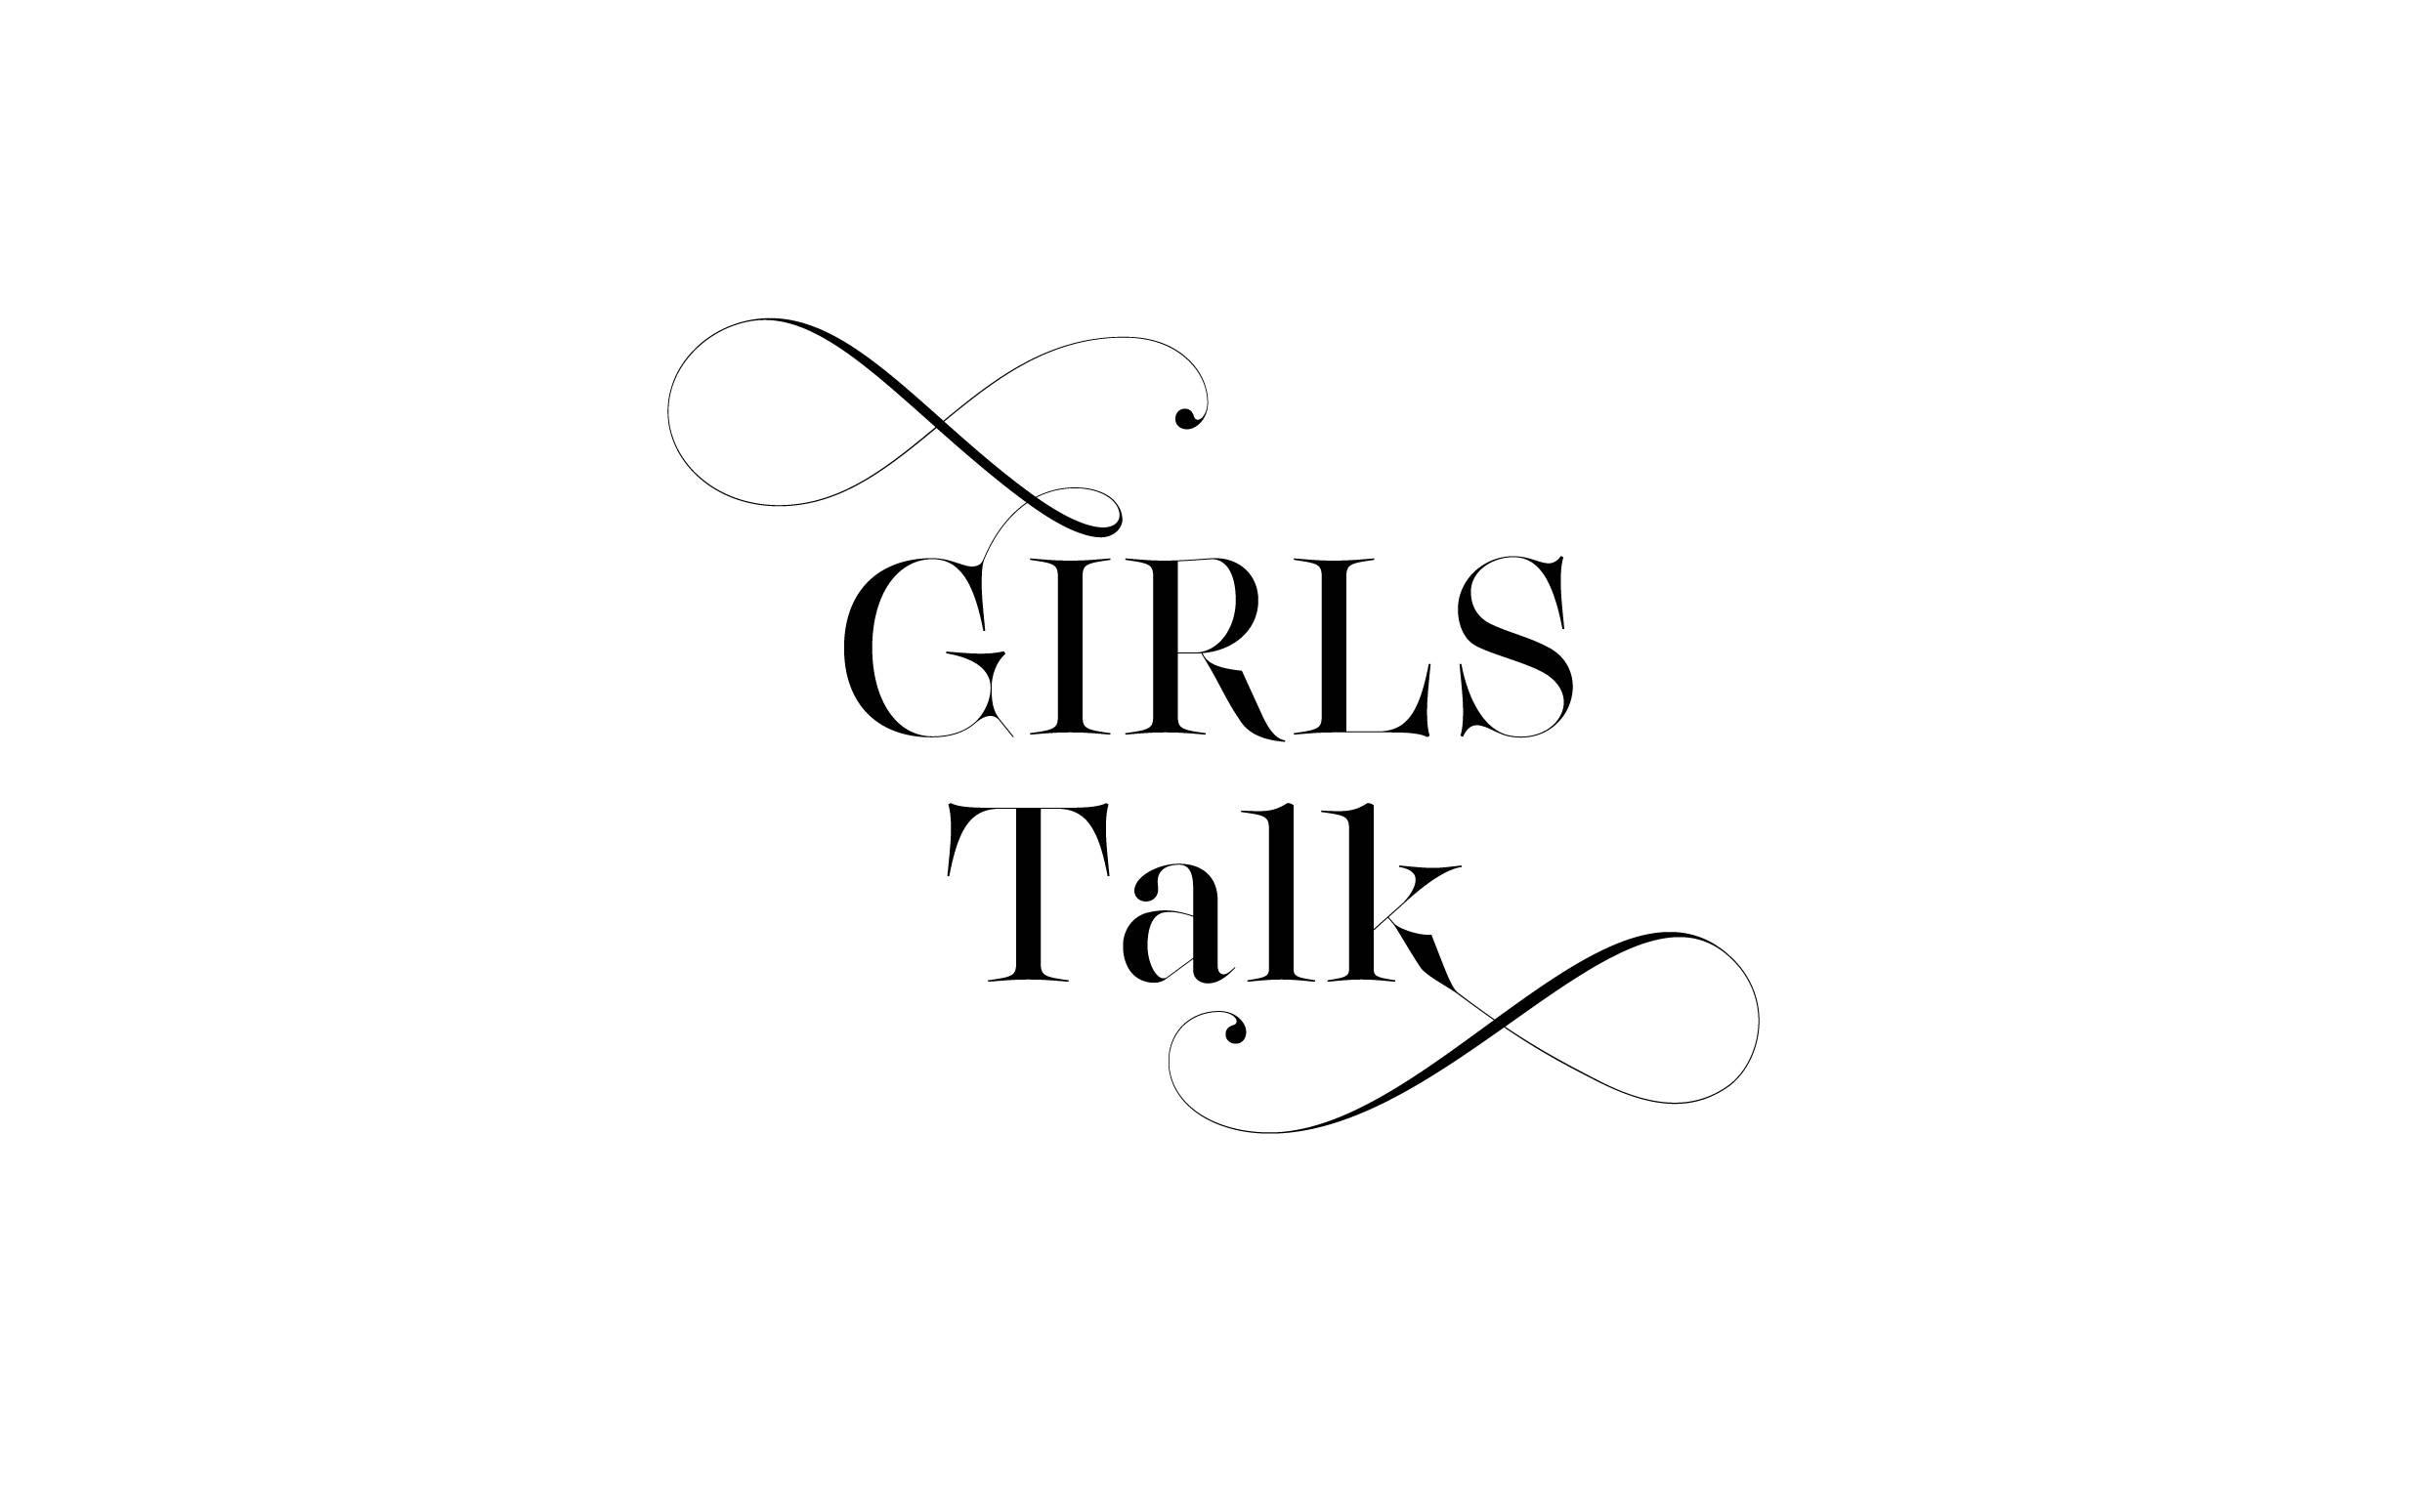 Girls talk - Custom sexy type collection by Moshik Nadav Typography